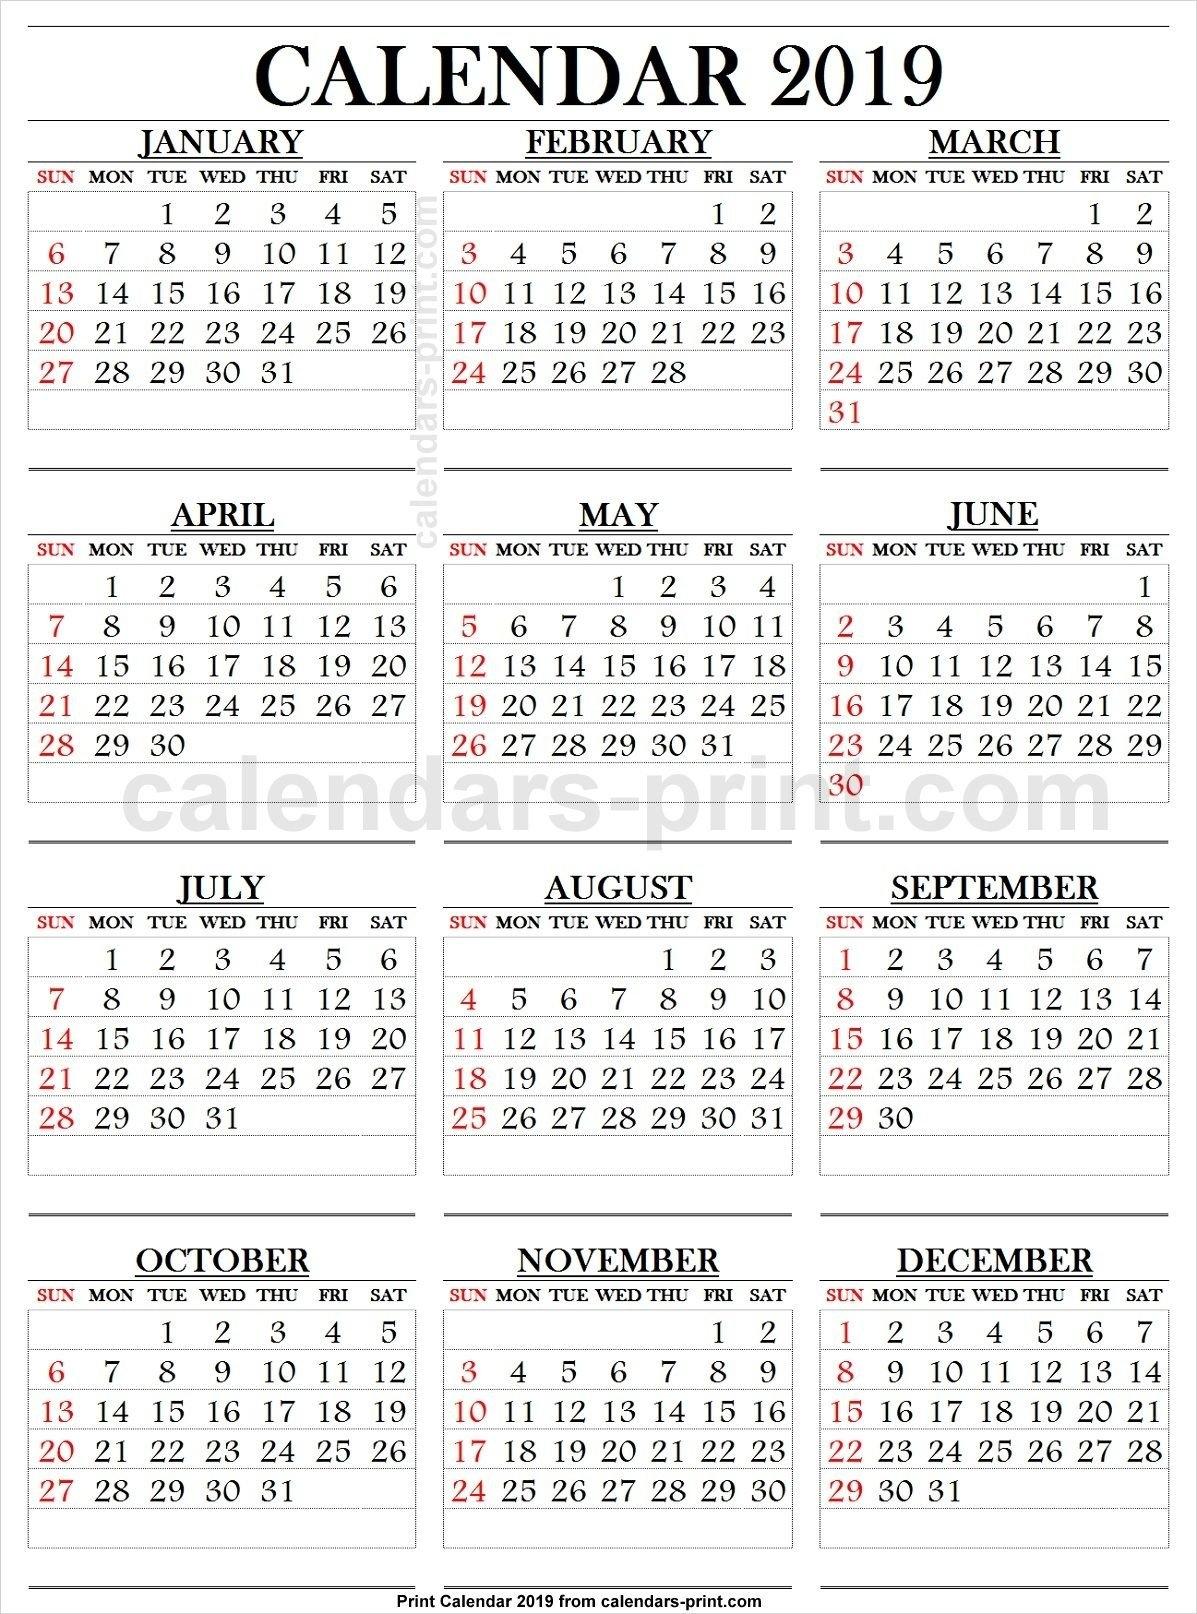 2019 Calendar Large Numbers | 2019 Yearly Calendar | Pinterest Calendar 2019 Large Print